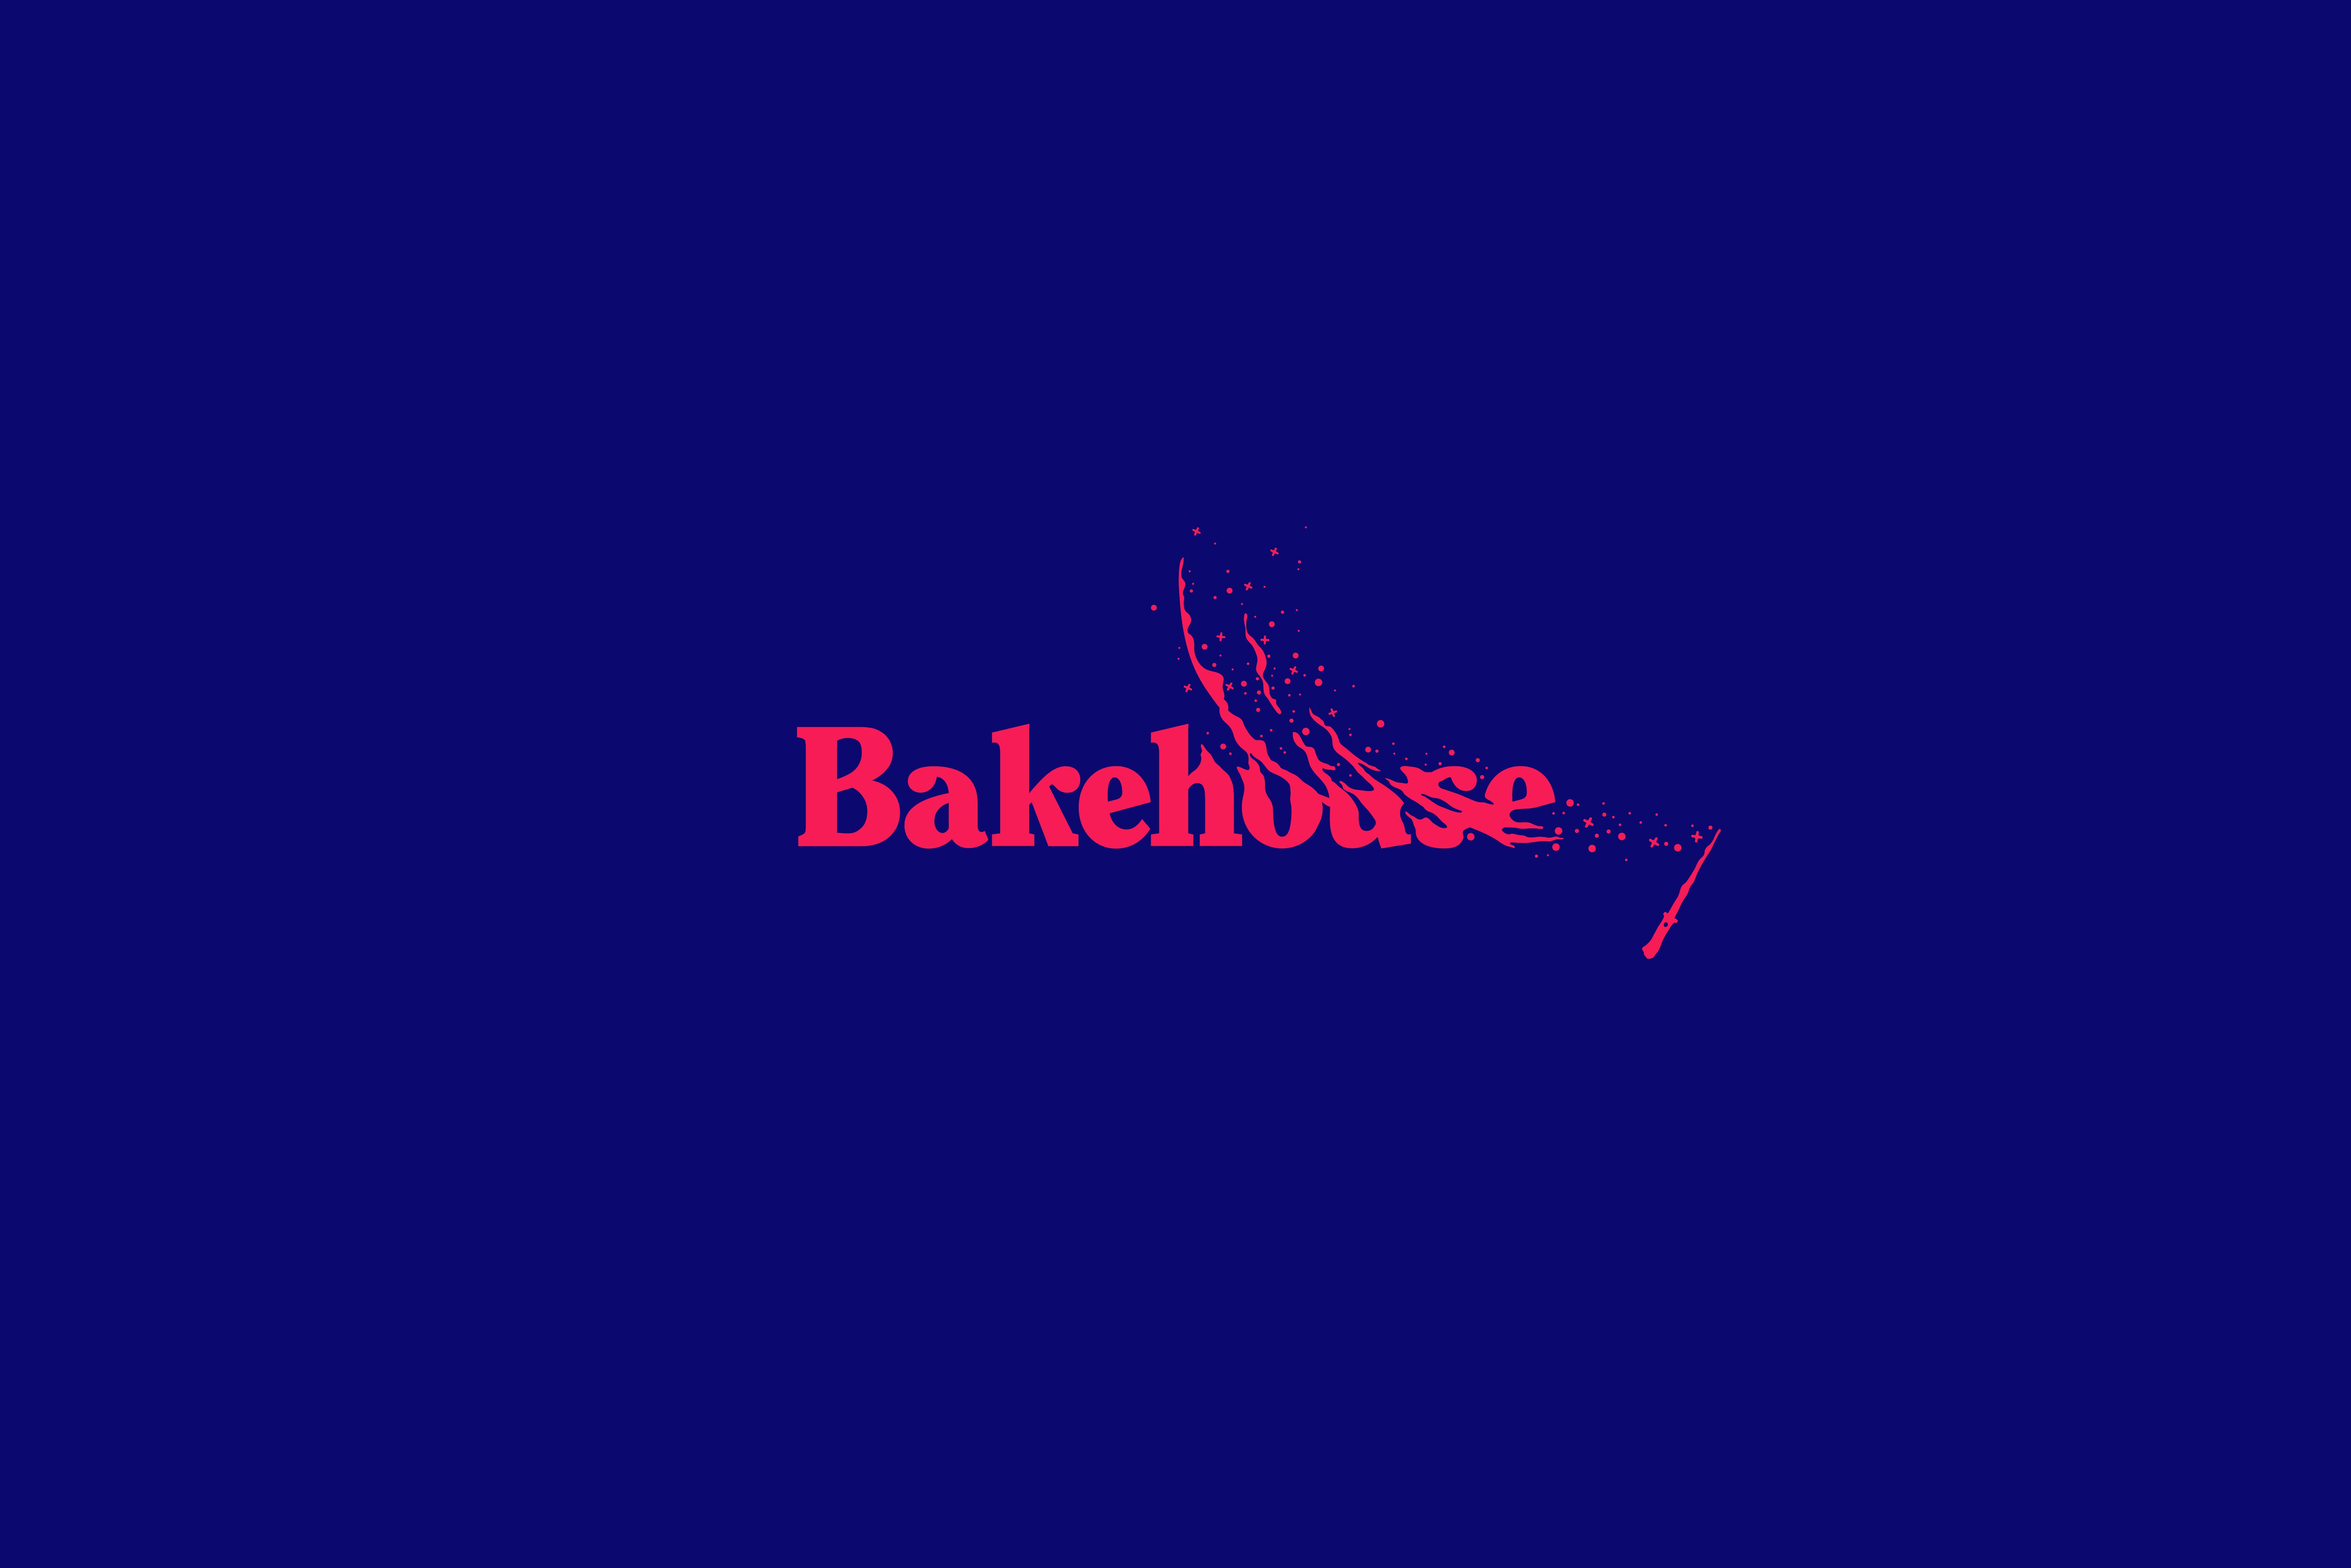 animated bakehouse logo – wand version – by fiasco design